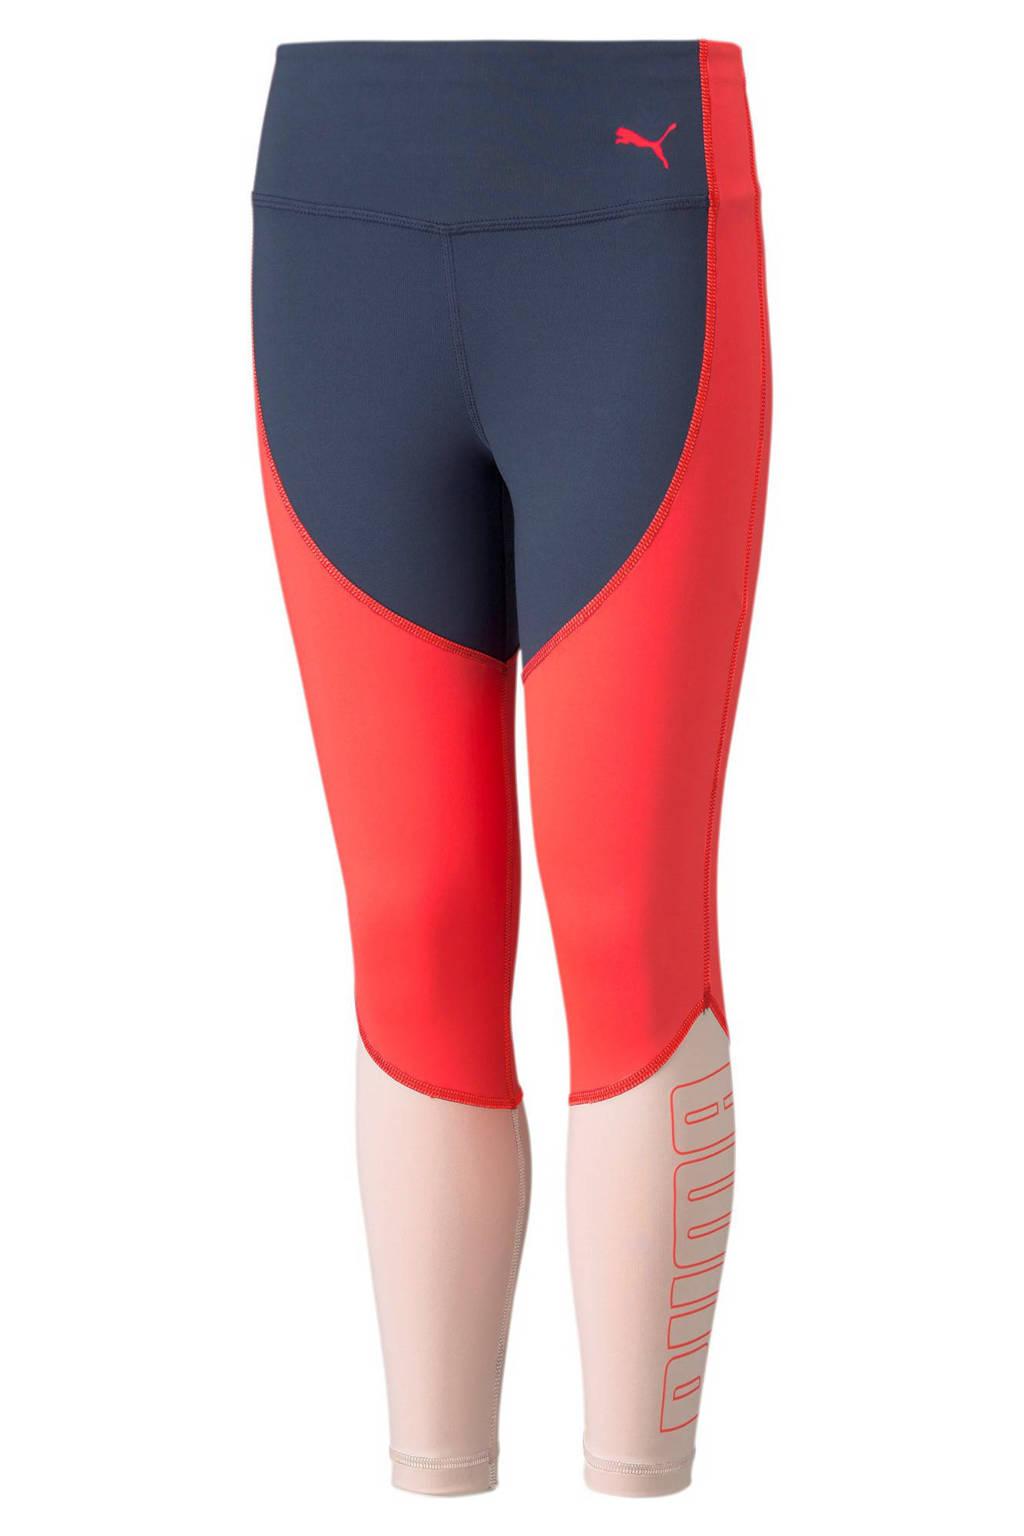 Puma legging met logo rood/lichtroze/donkerblauw, Rood/lichtroze/donkerblauw